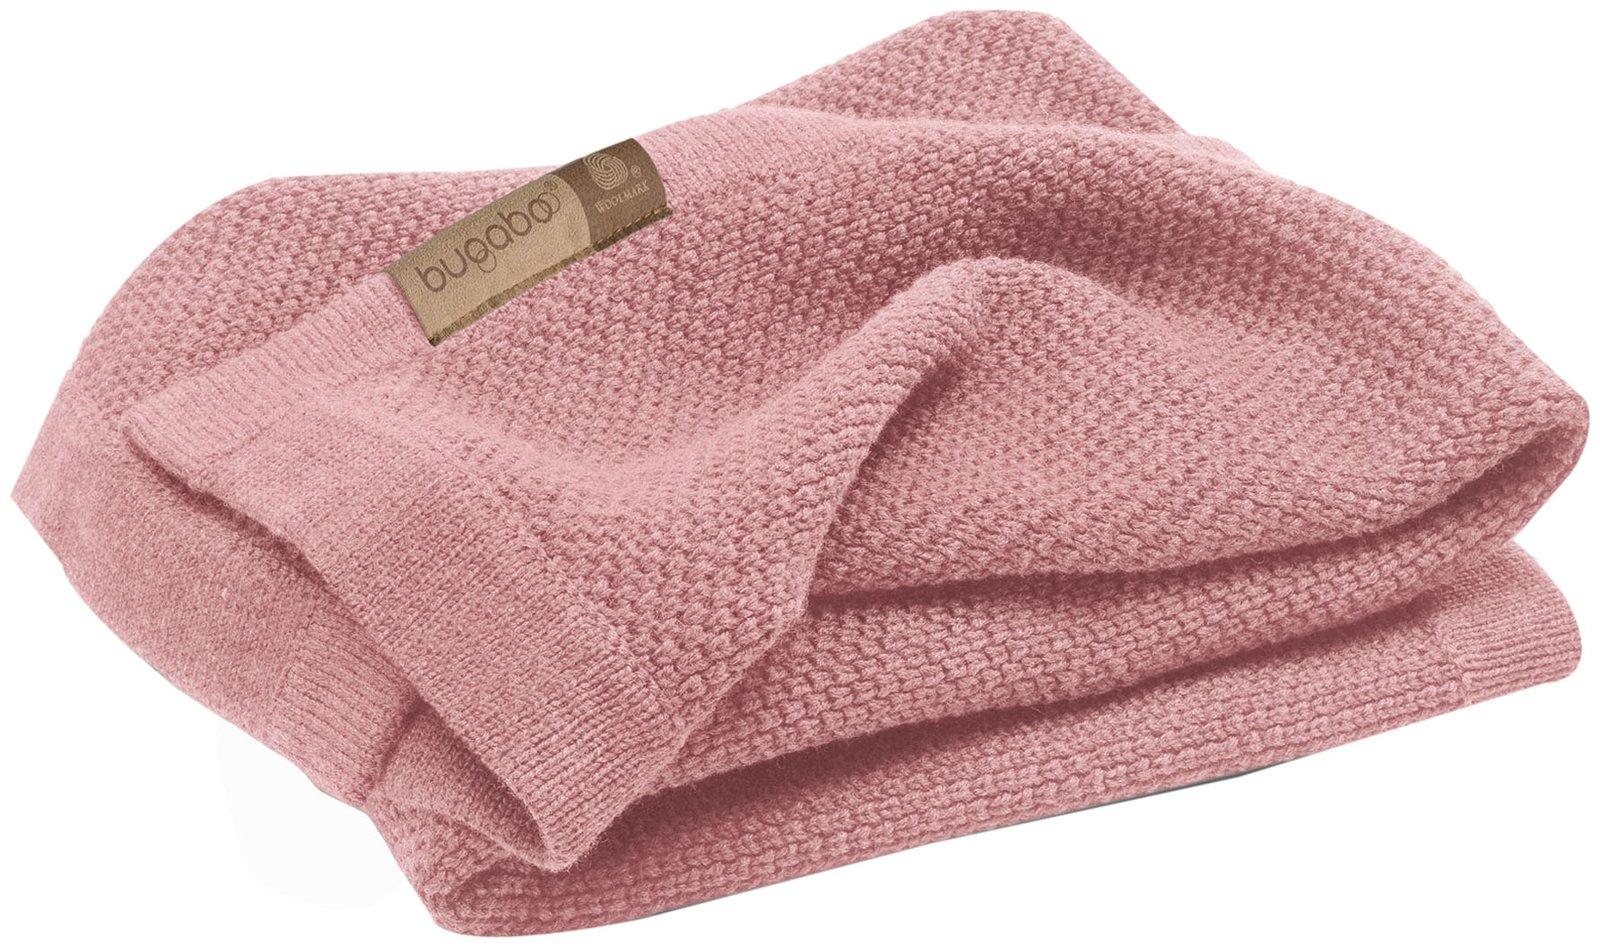 Blanket clipart woolen. Sab pacific bpcharitypinkfolded bugaboowoolblanketrose